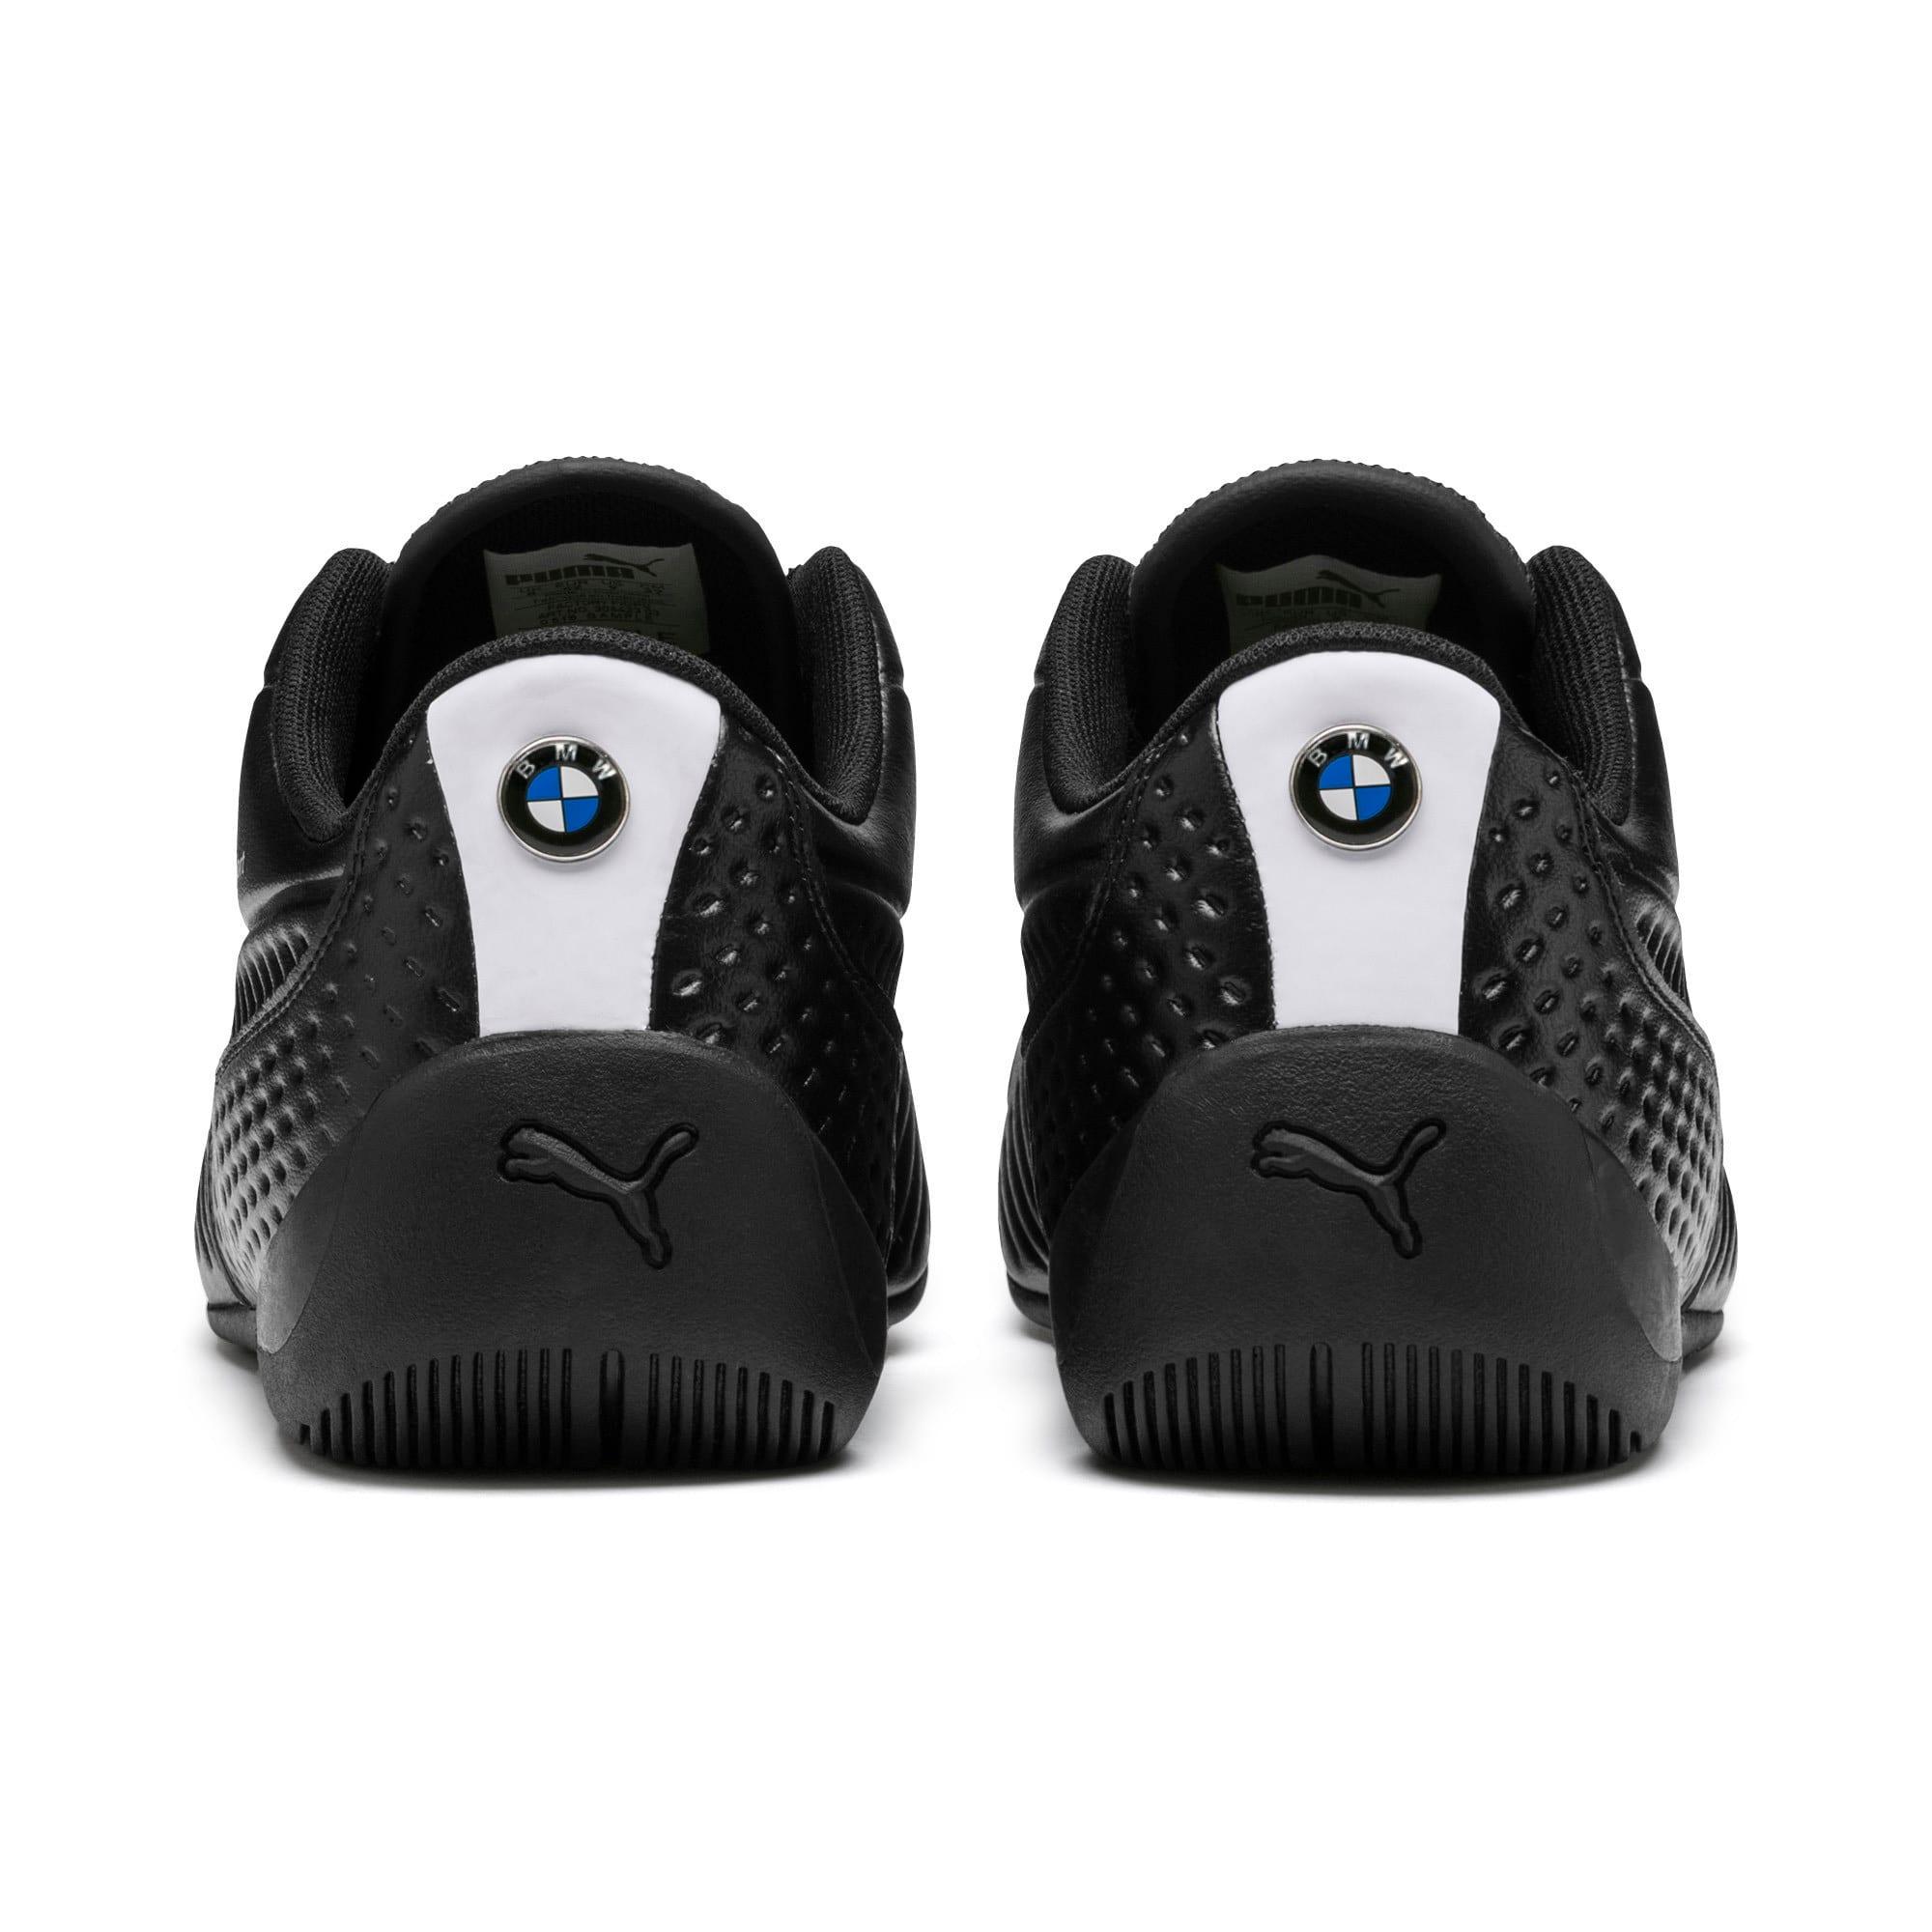 Thumbnail 4 of BMW M Motorsport Drift Cat 7S Ultra Shoes, Puma Black-Puma White, medium